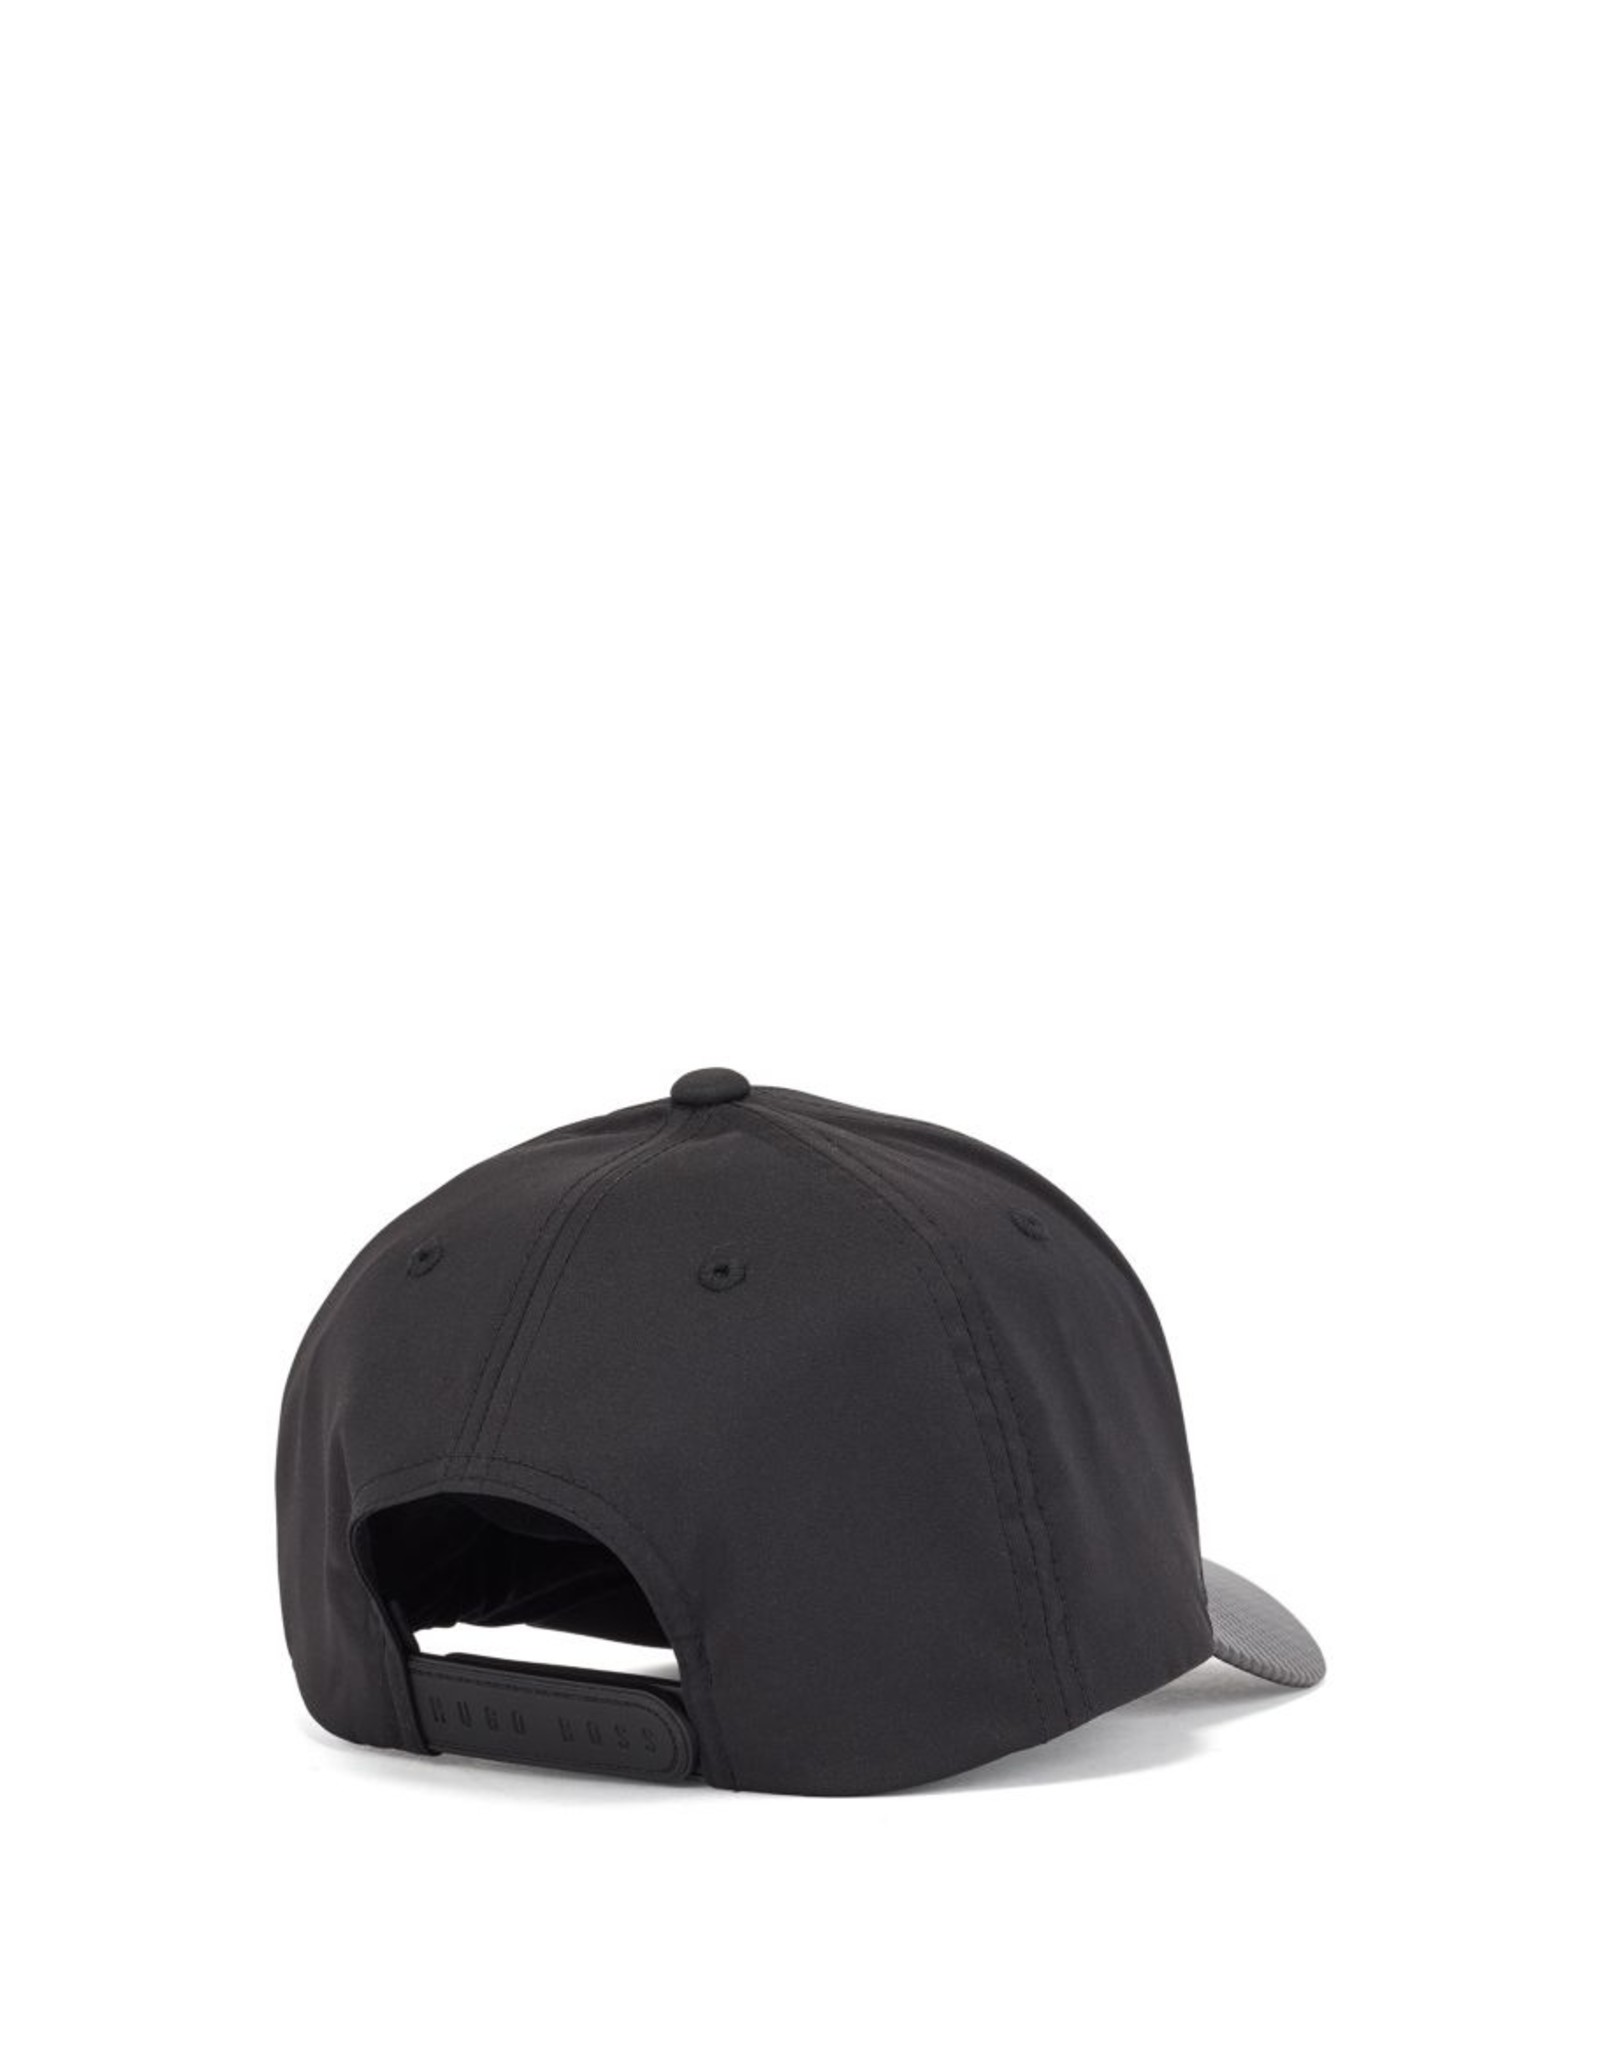 BOSS ATHLEISURE BOSS ATHLEISURE CAP CARBON F20